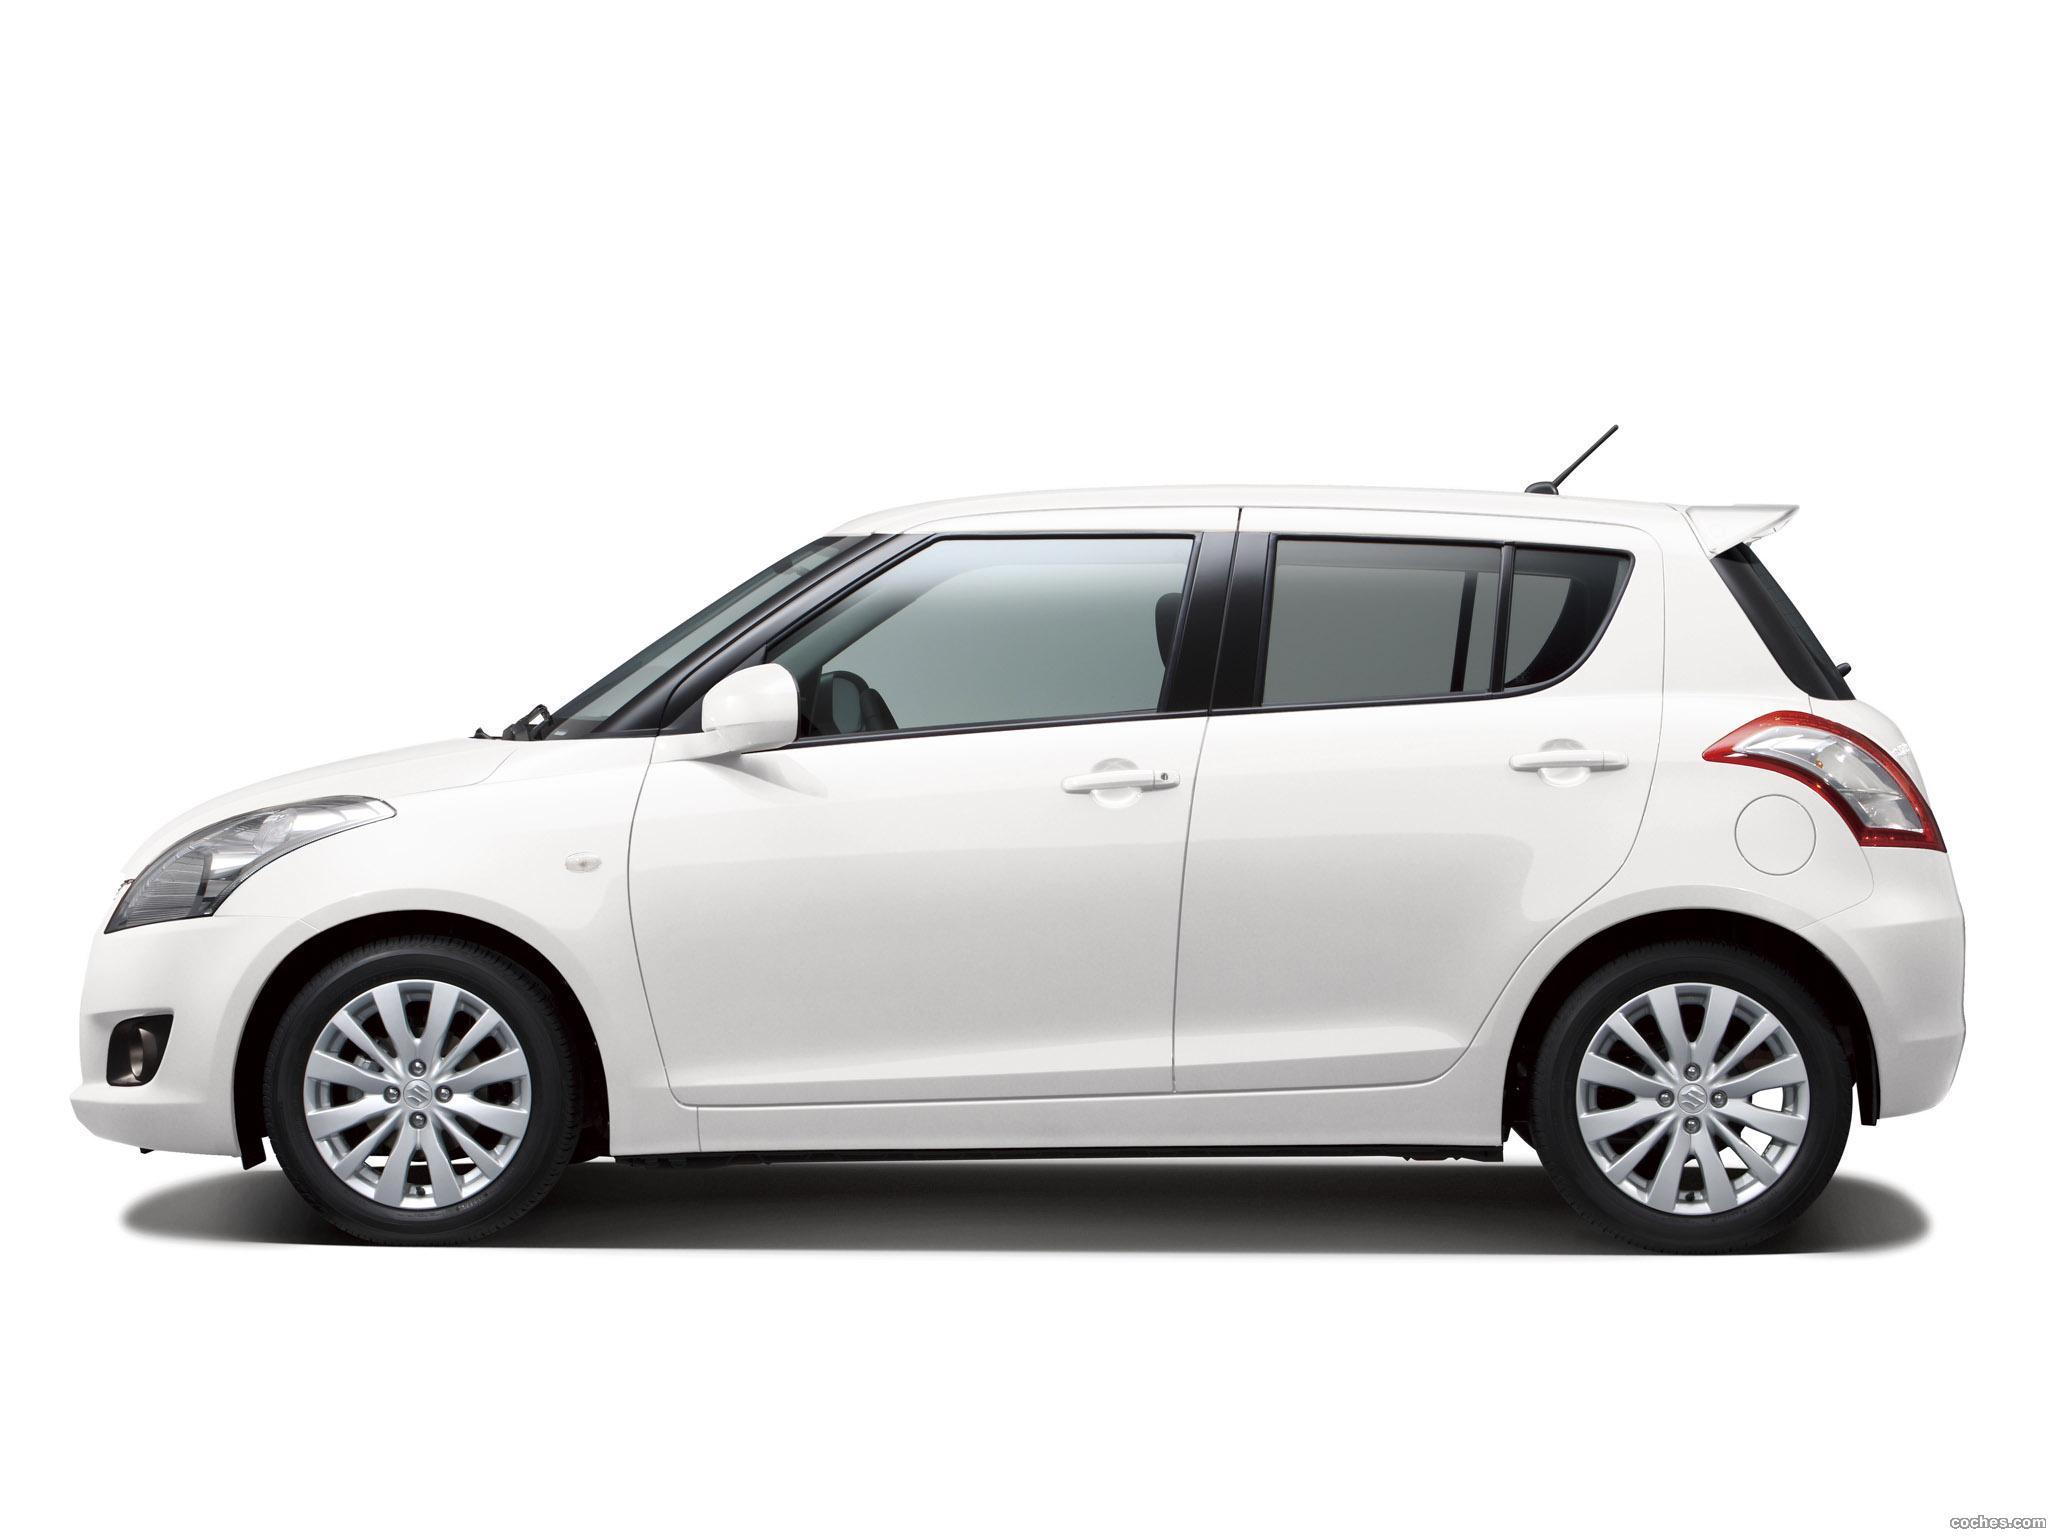 Foto 2 de Suzuki Swift Style-S 2012